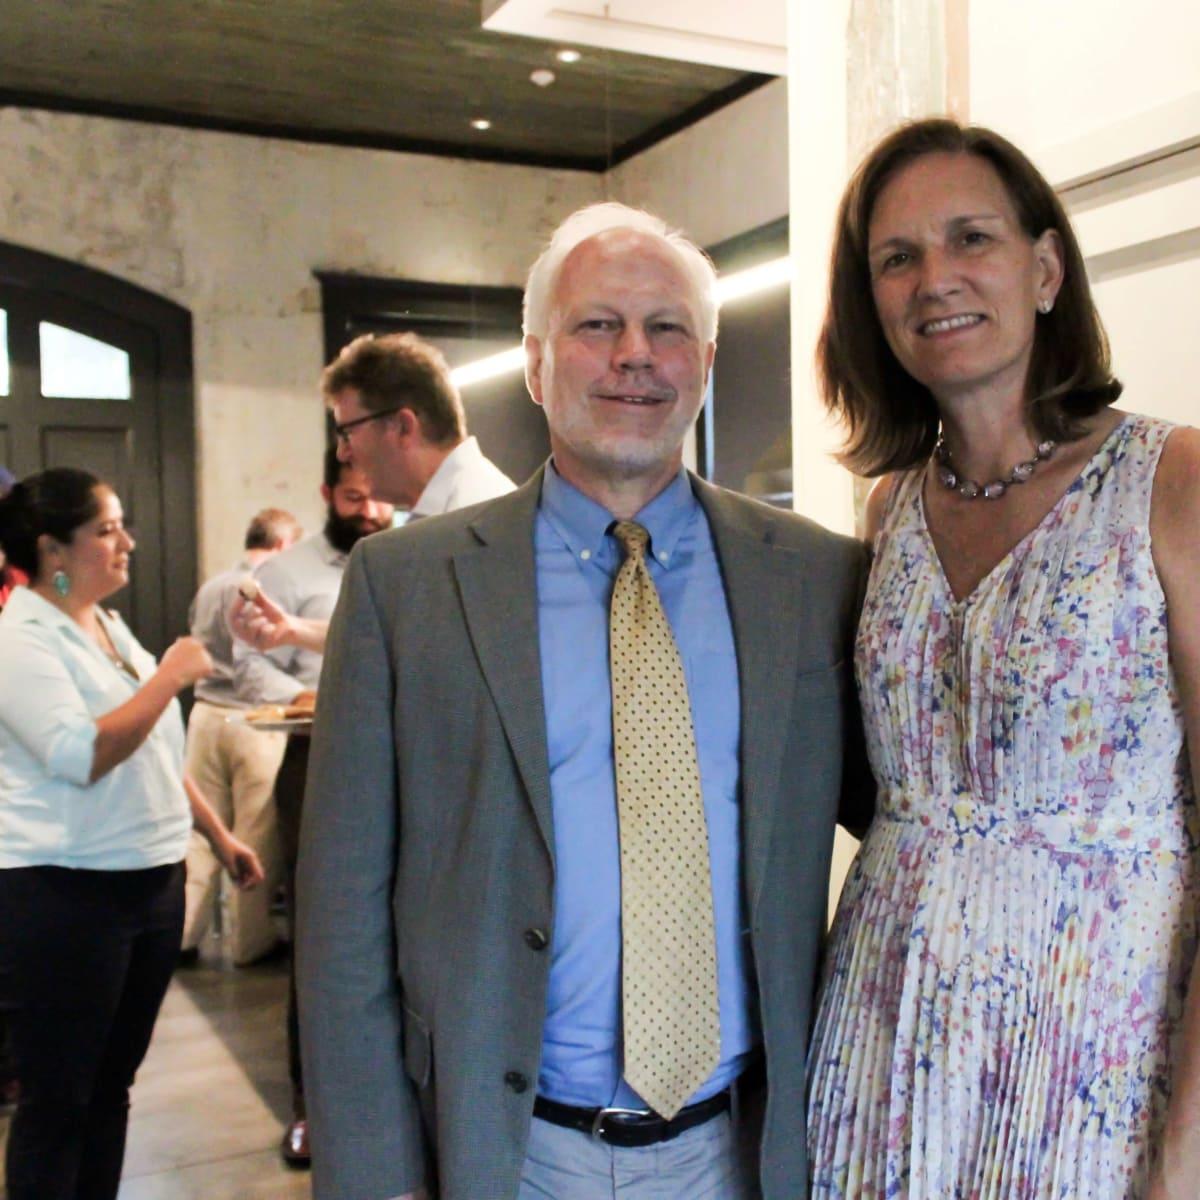 Houston Parks Board event, 7/16, Lee Ehmke, Anne Whitlock